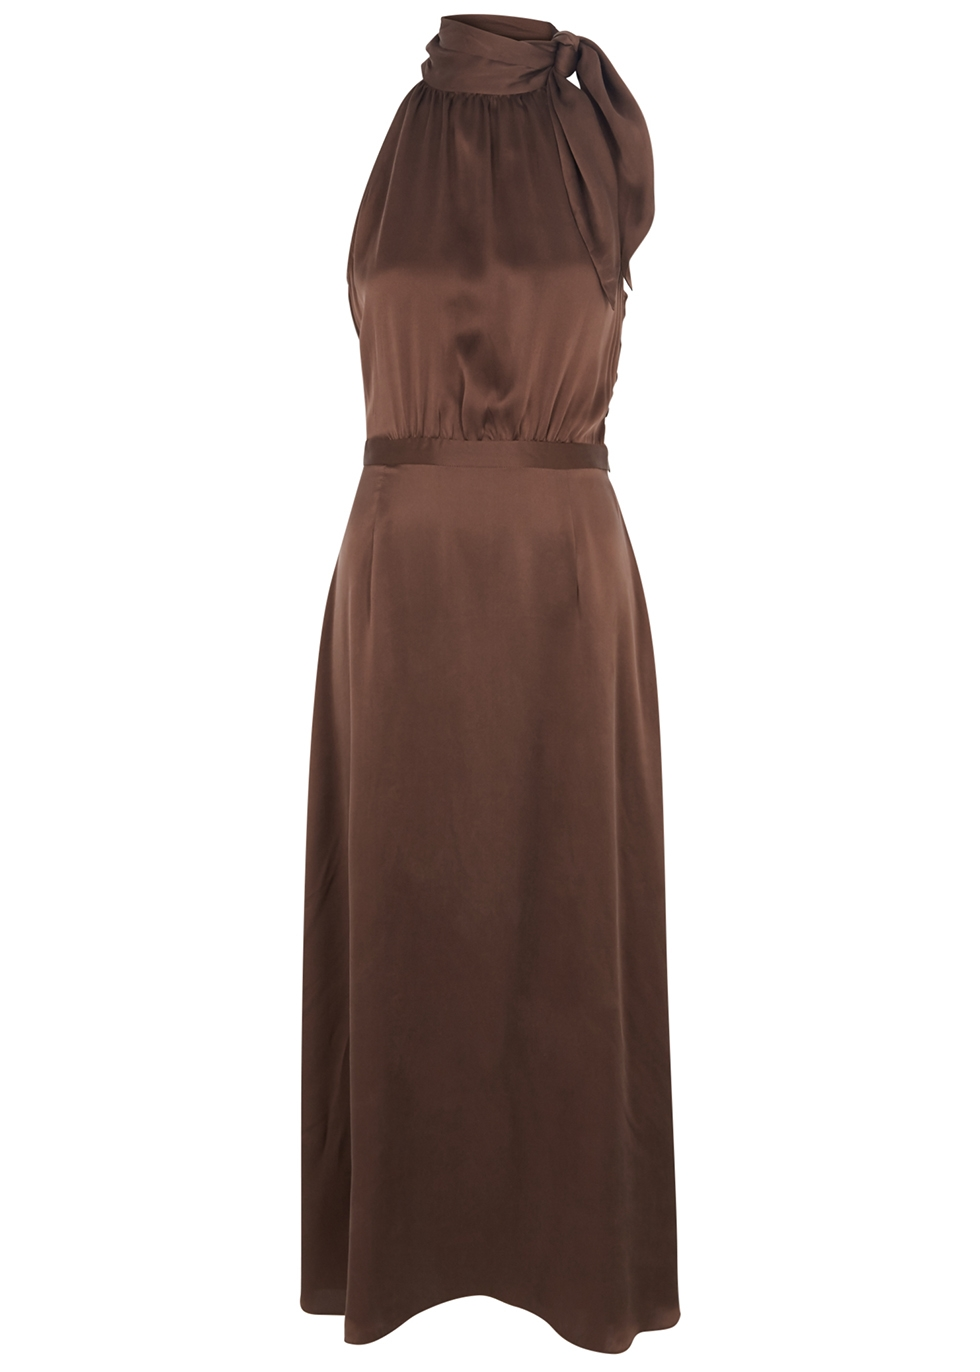 243f5532b6ed Designer Dresses   Designer Gowns - Harvey Nichols